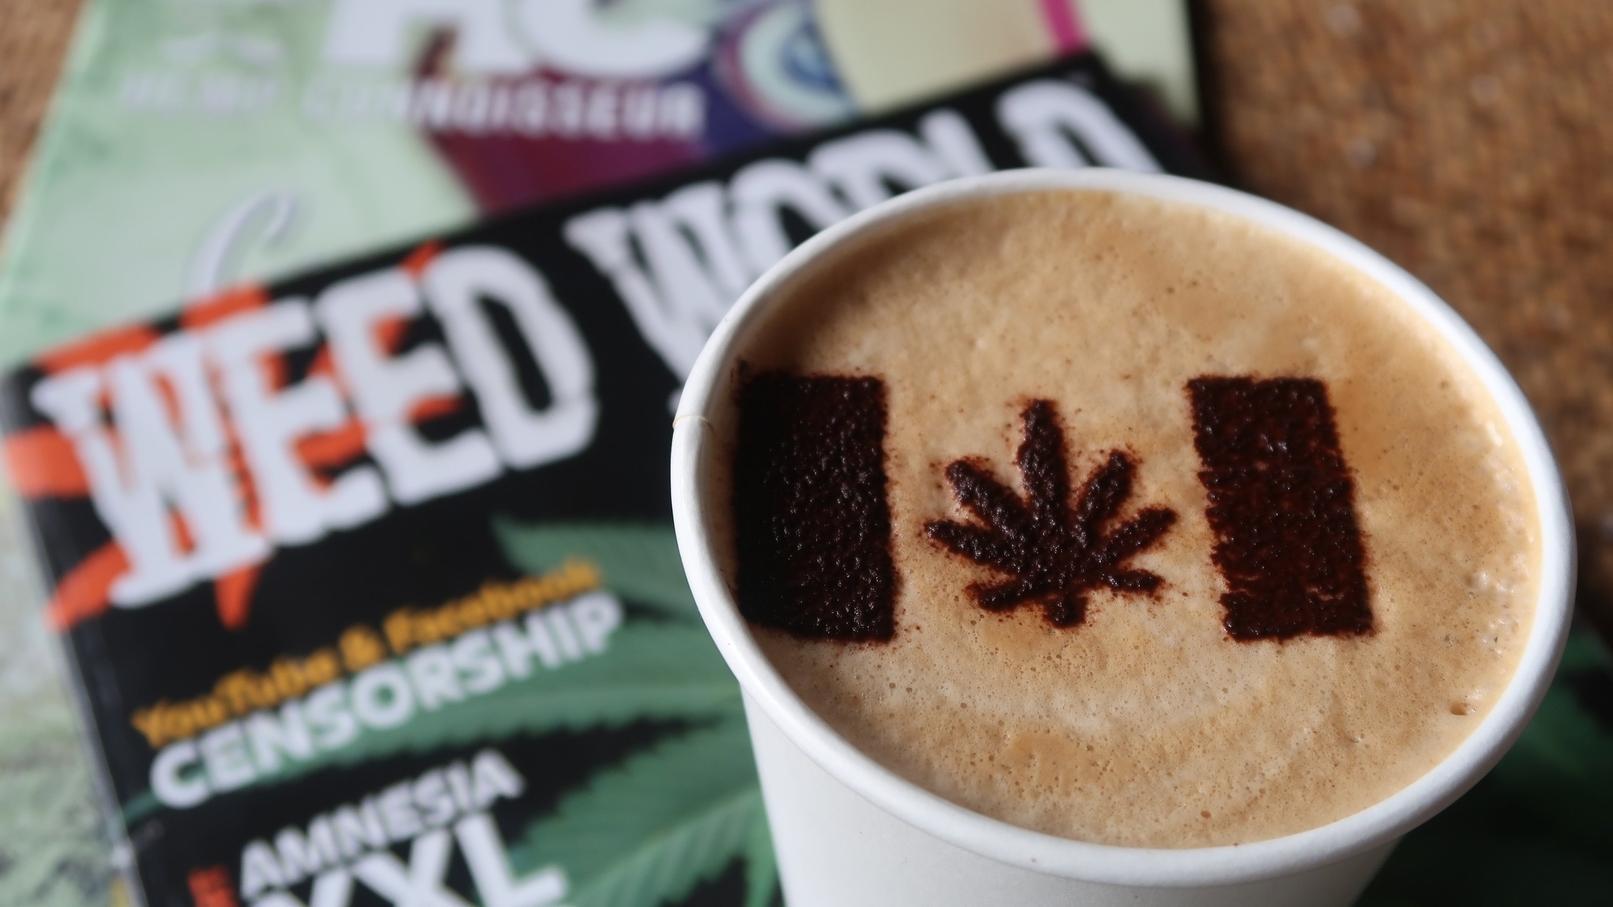 Kaffee mit Cannabis